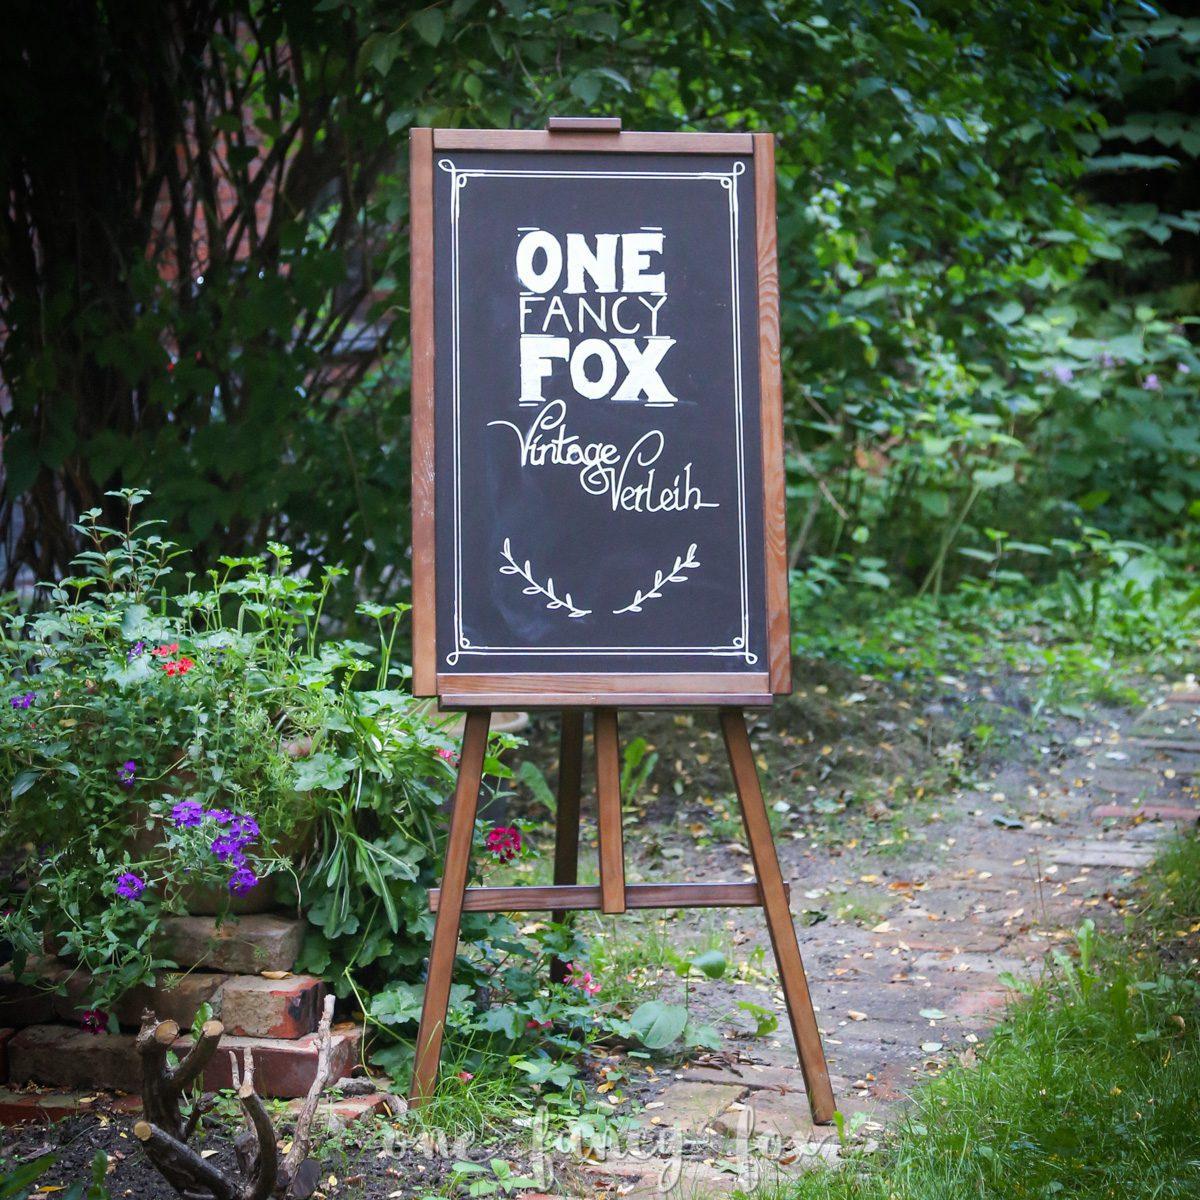 Holz Staffelei mit Tafel bei One Fancy Fox mieten